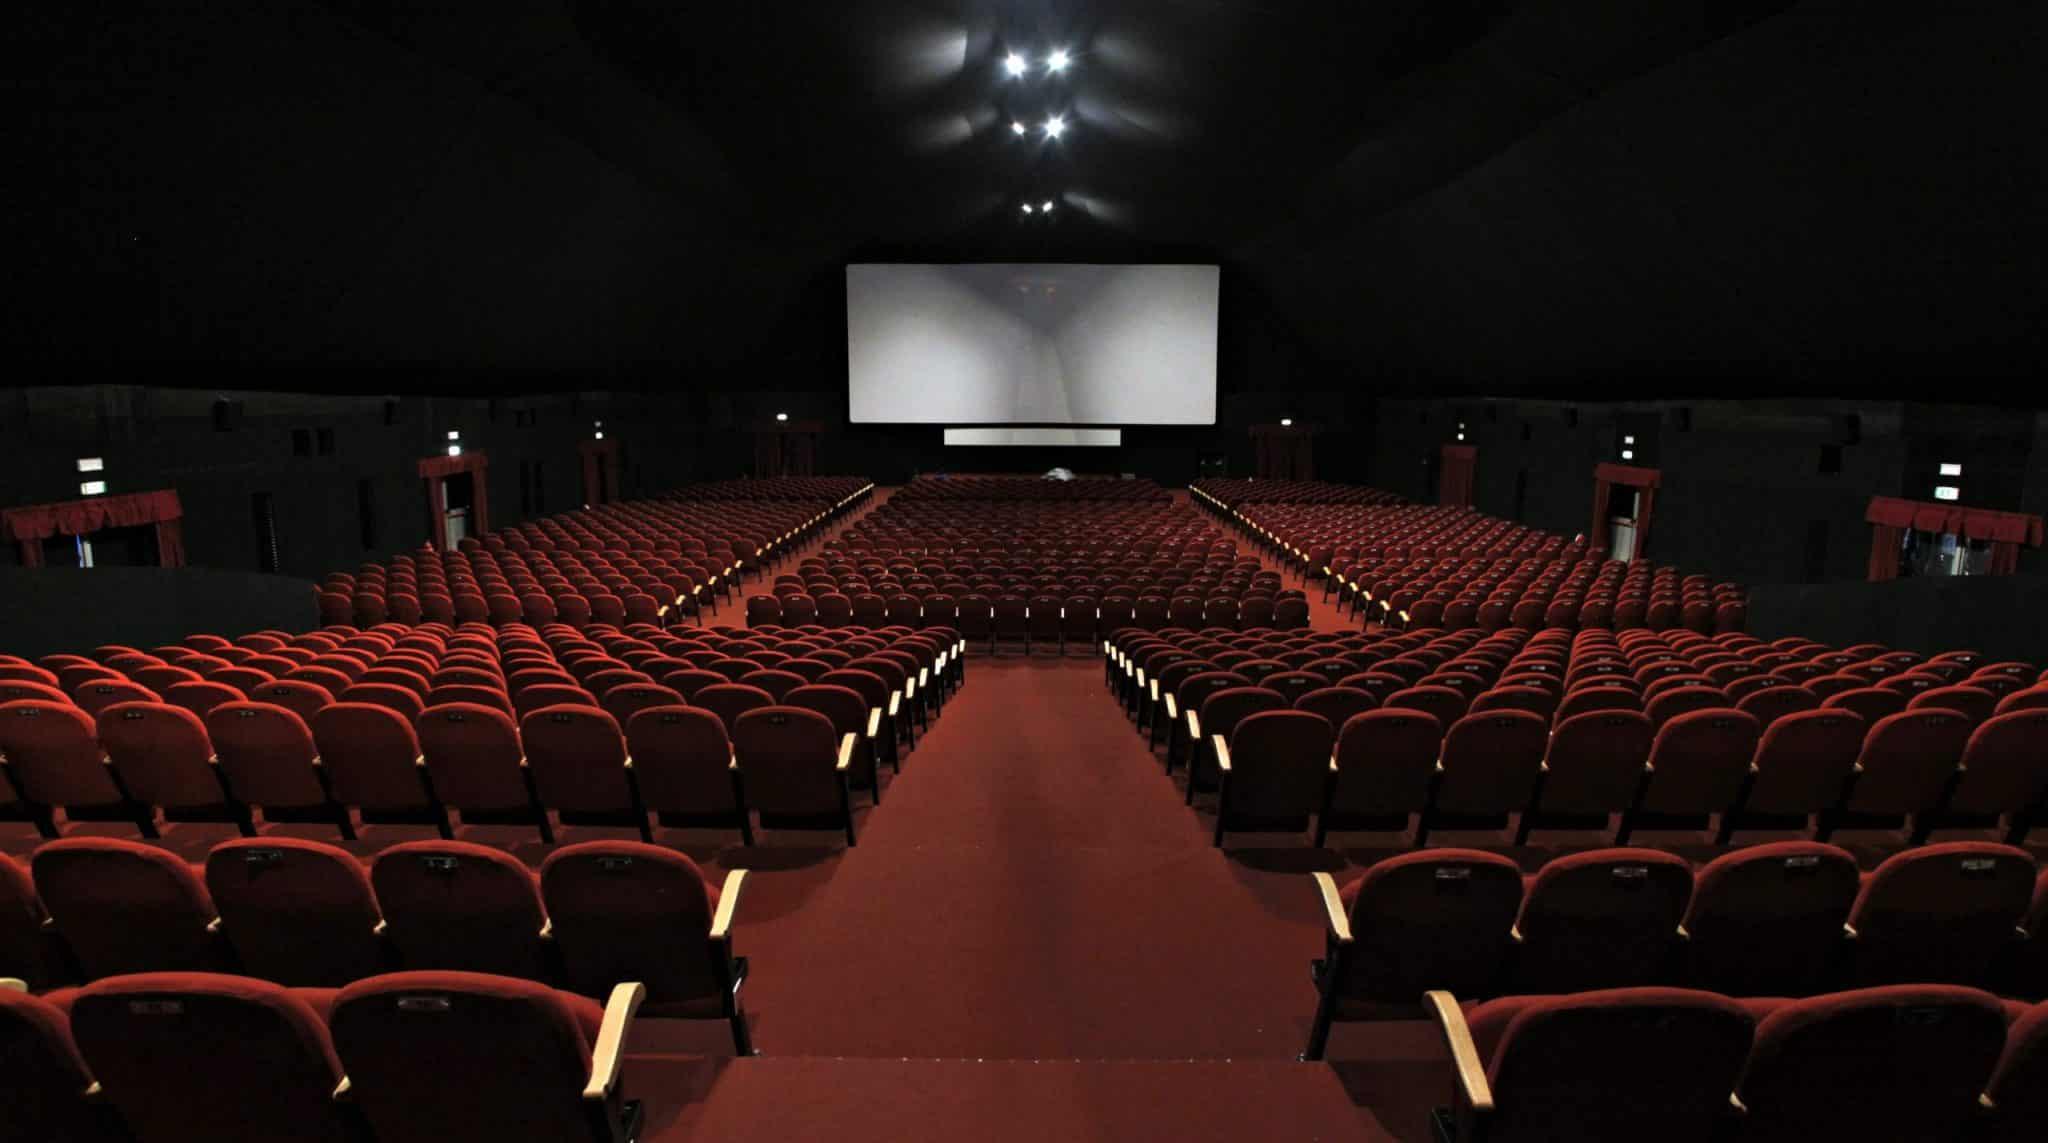 Cinema Theather